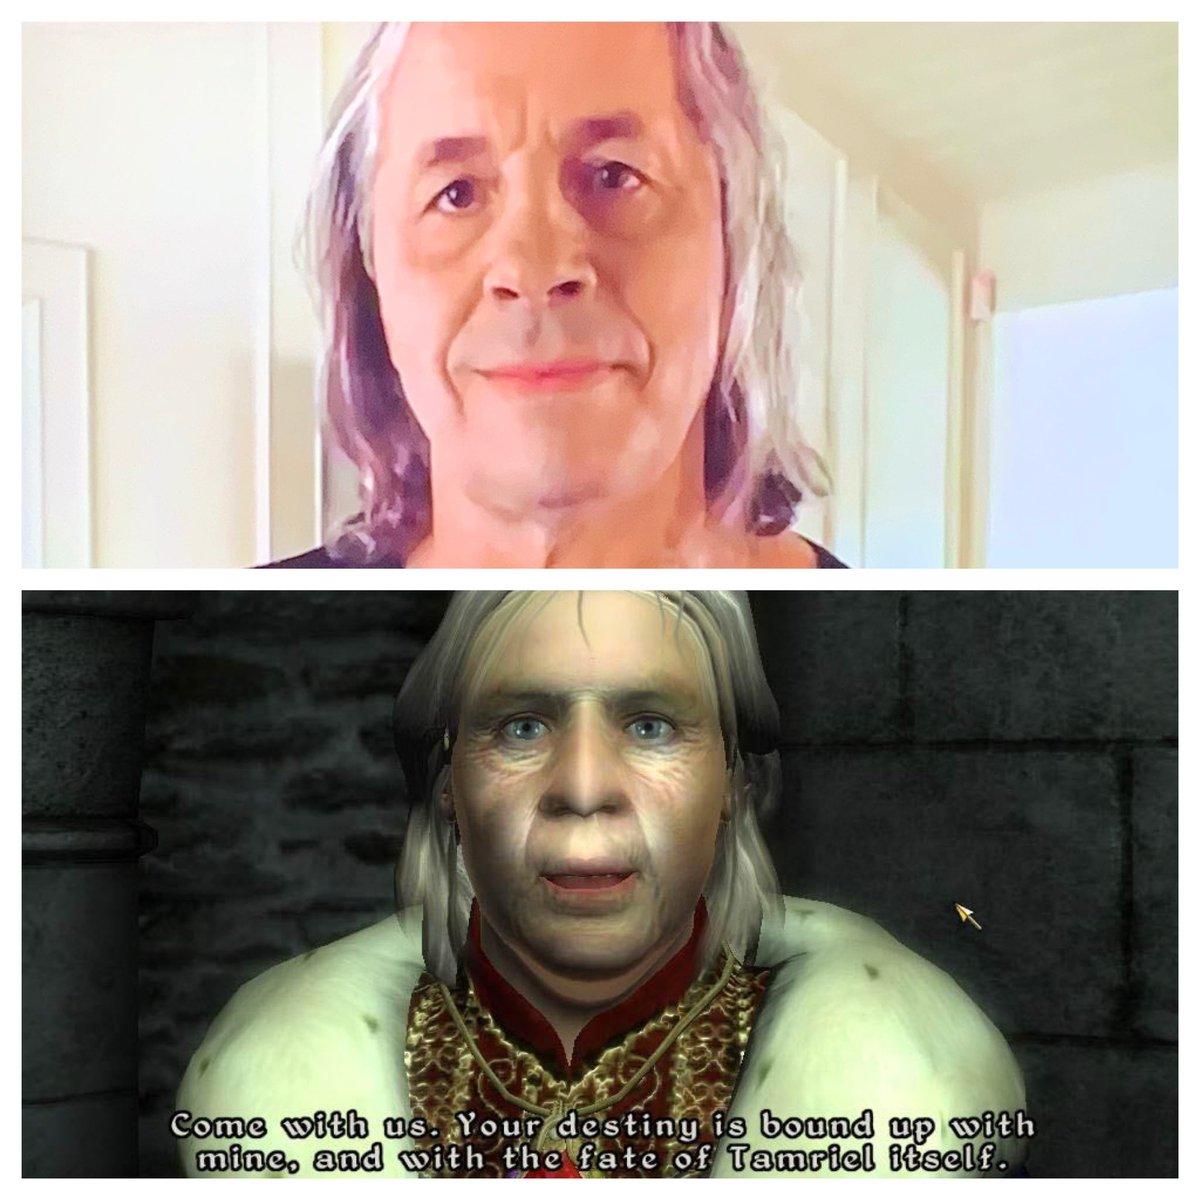 @BretHart looks like Uriel Septim from Oblivion. #elderscrolls #oblivion #urielseptim #brethart #brethitmanhart #wwe #wwf #wcw #bethesdapic.twitter.com/NA3f5qgnr1